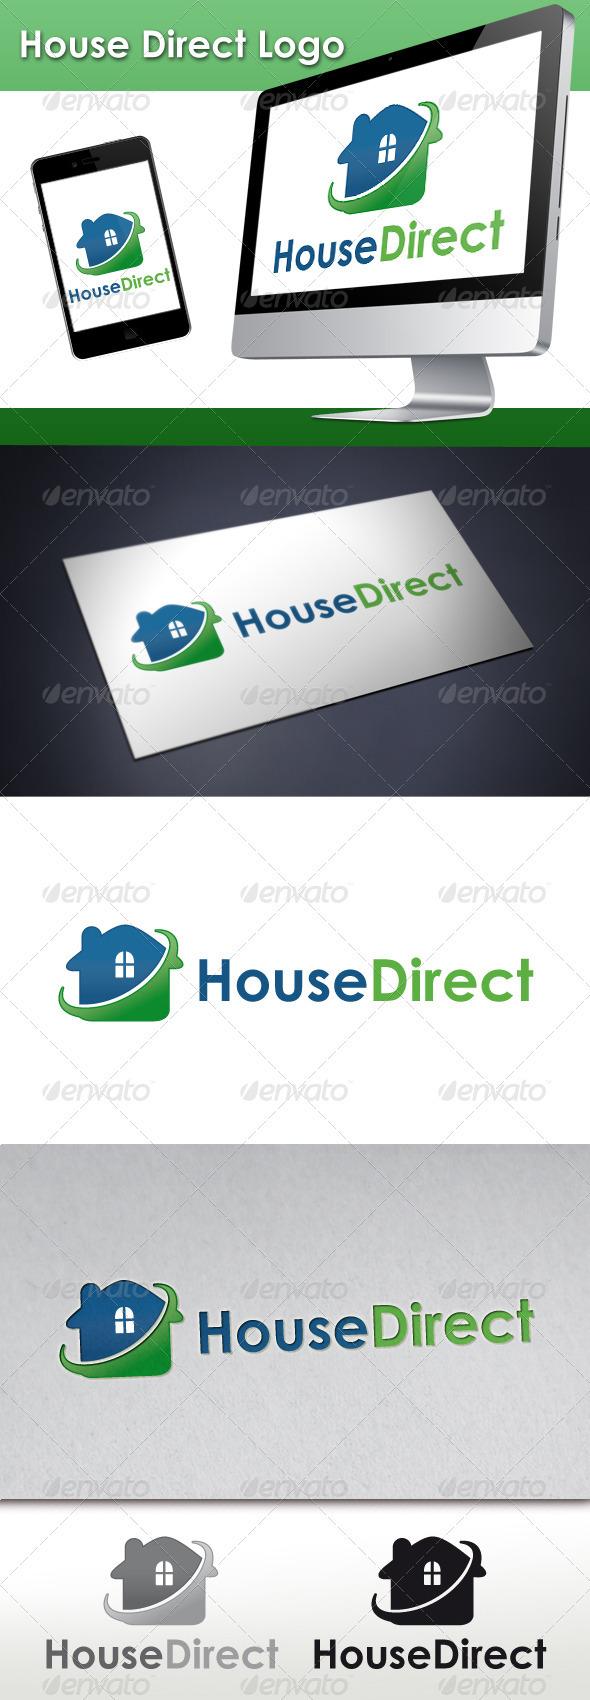 GraphicRiver House Direct Logo 3416435